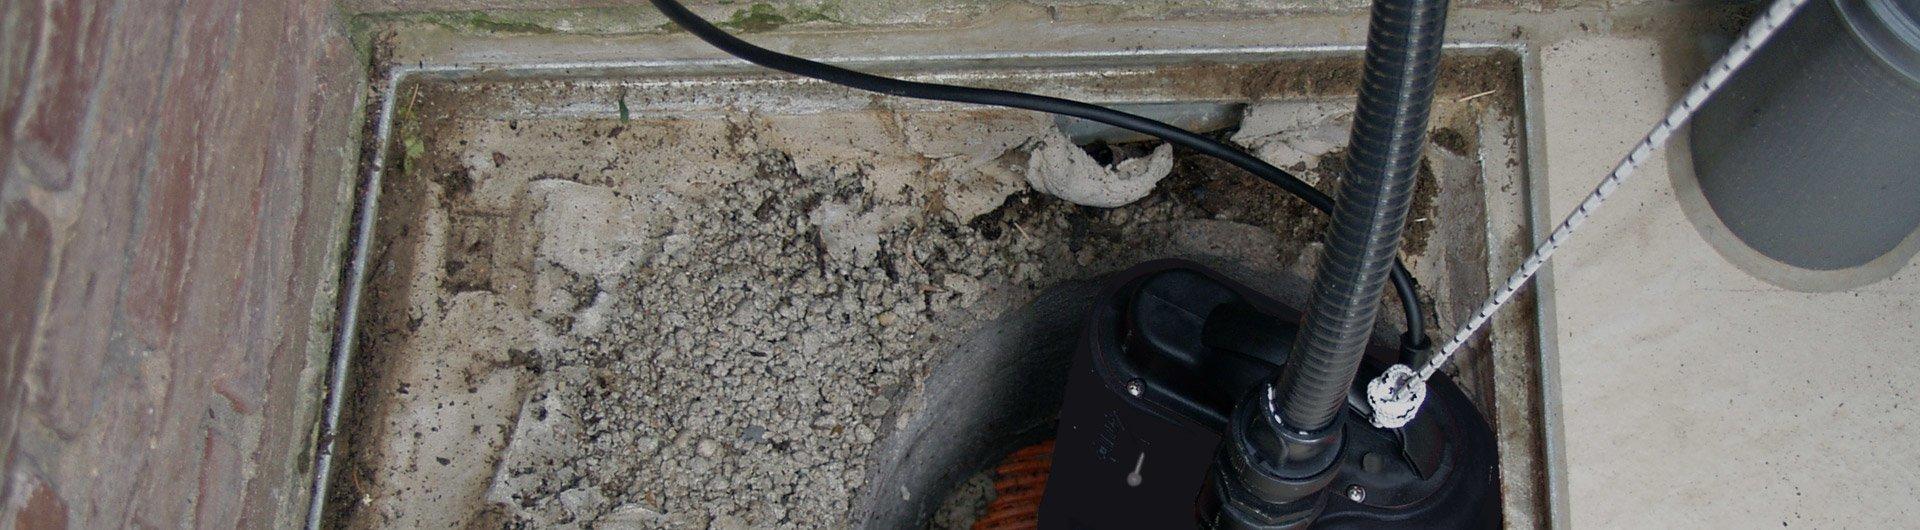 Sliderbild-drainage-tauchpumpe